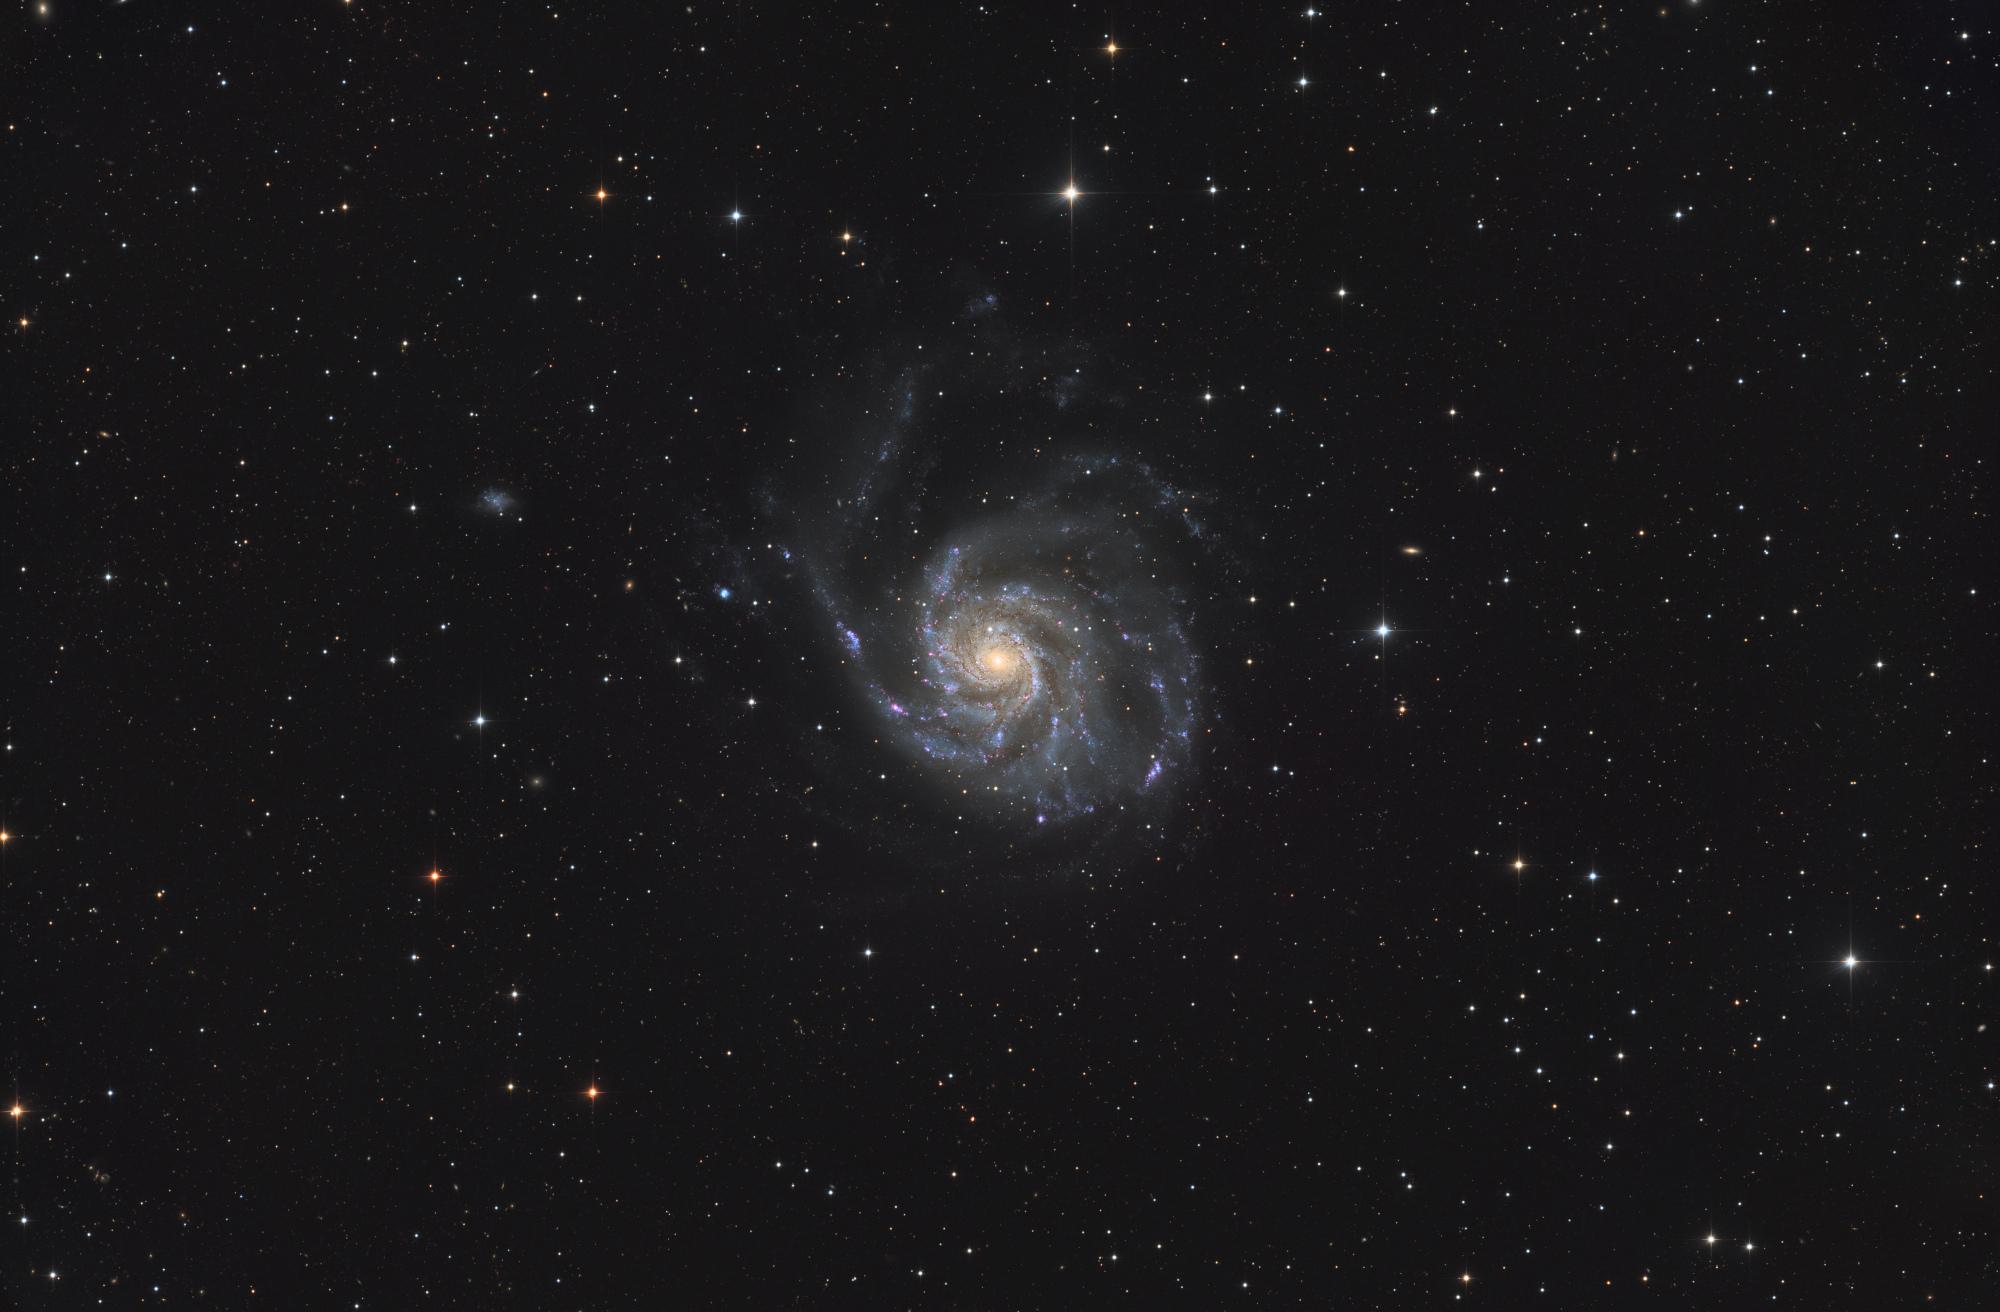 M101-LRVB-V42.thumb.jpg.e208bf9433972fded0383fbed8d247a0.jpg